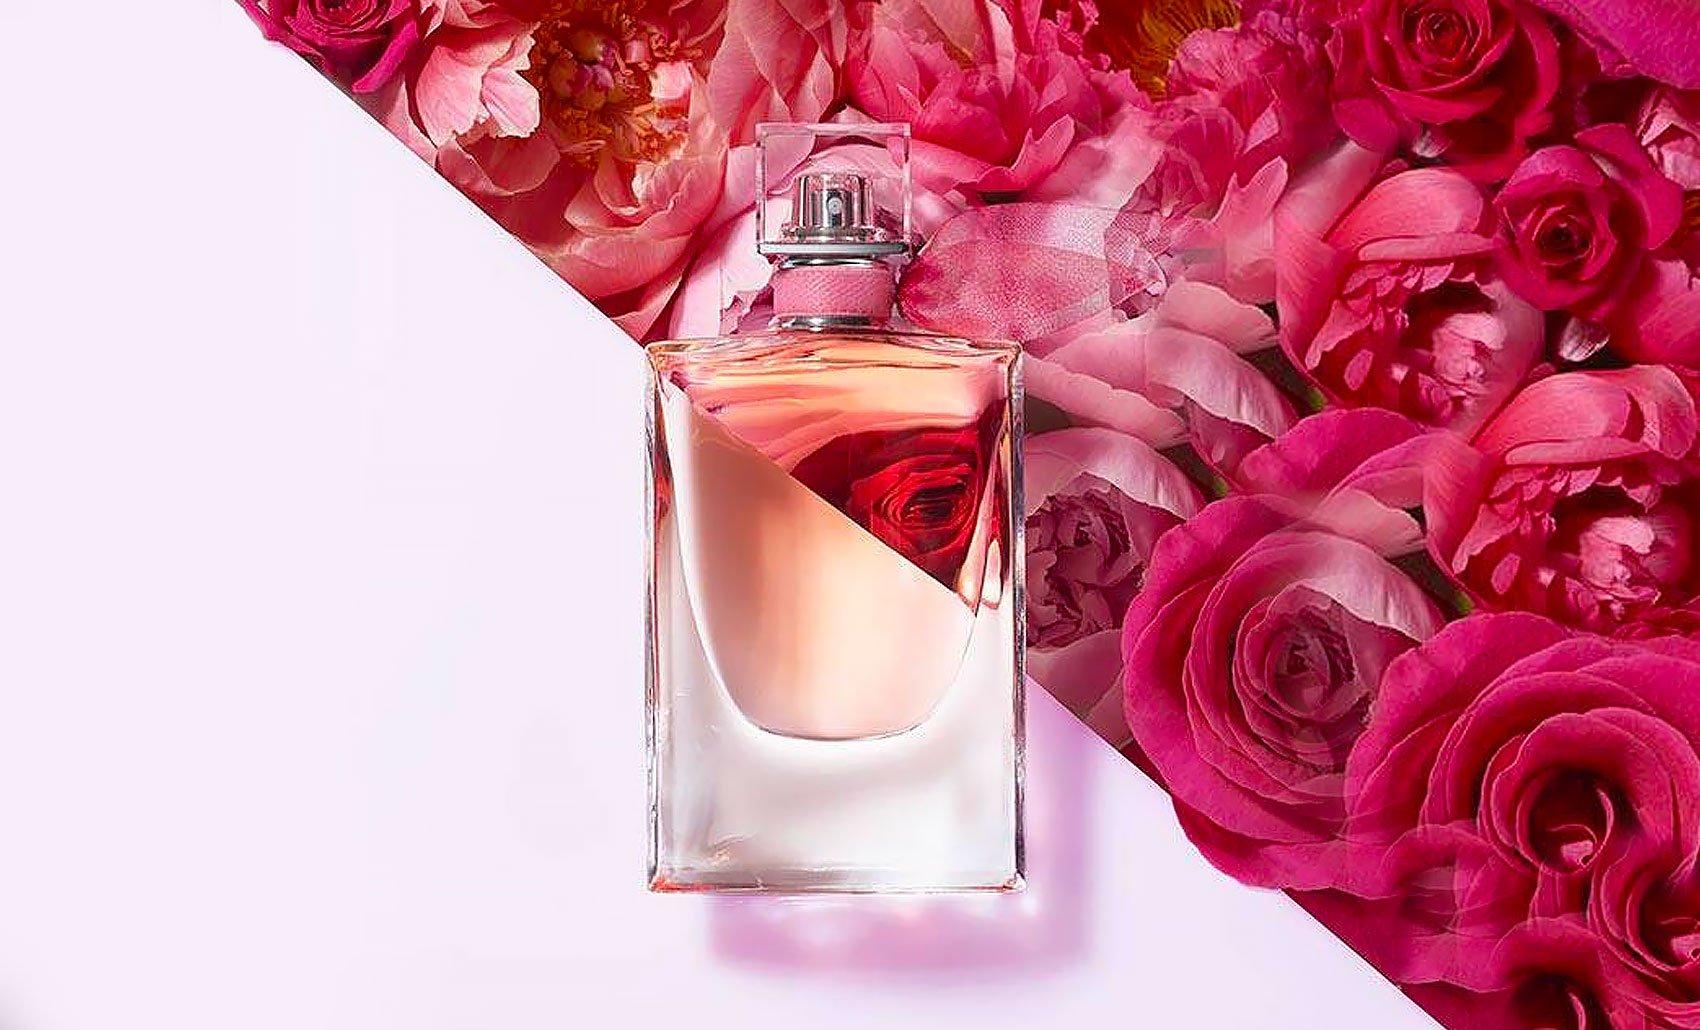 LancômeLe ParfumeurApril LancômeLe ParfumeurApril LancômeLe ParfumeurApril ParfumeurApril LancômeLe QCsthdr